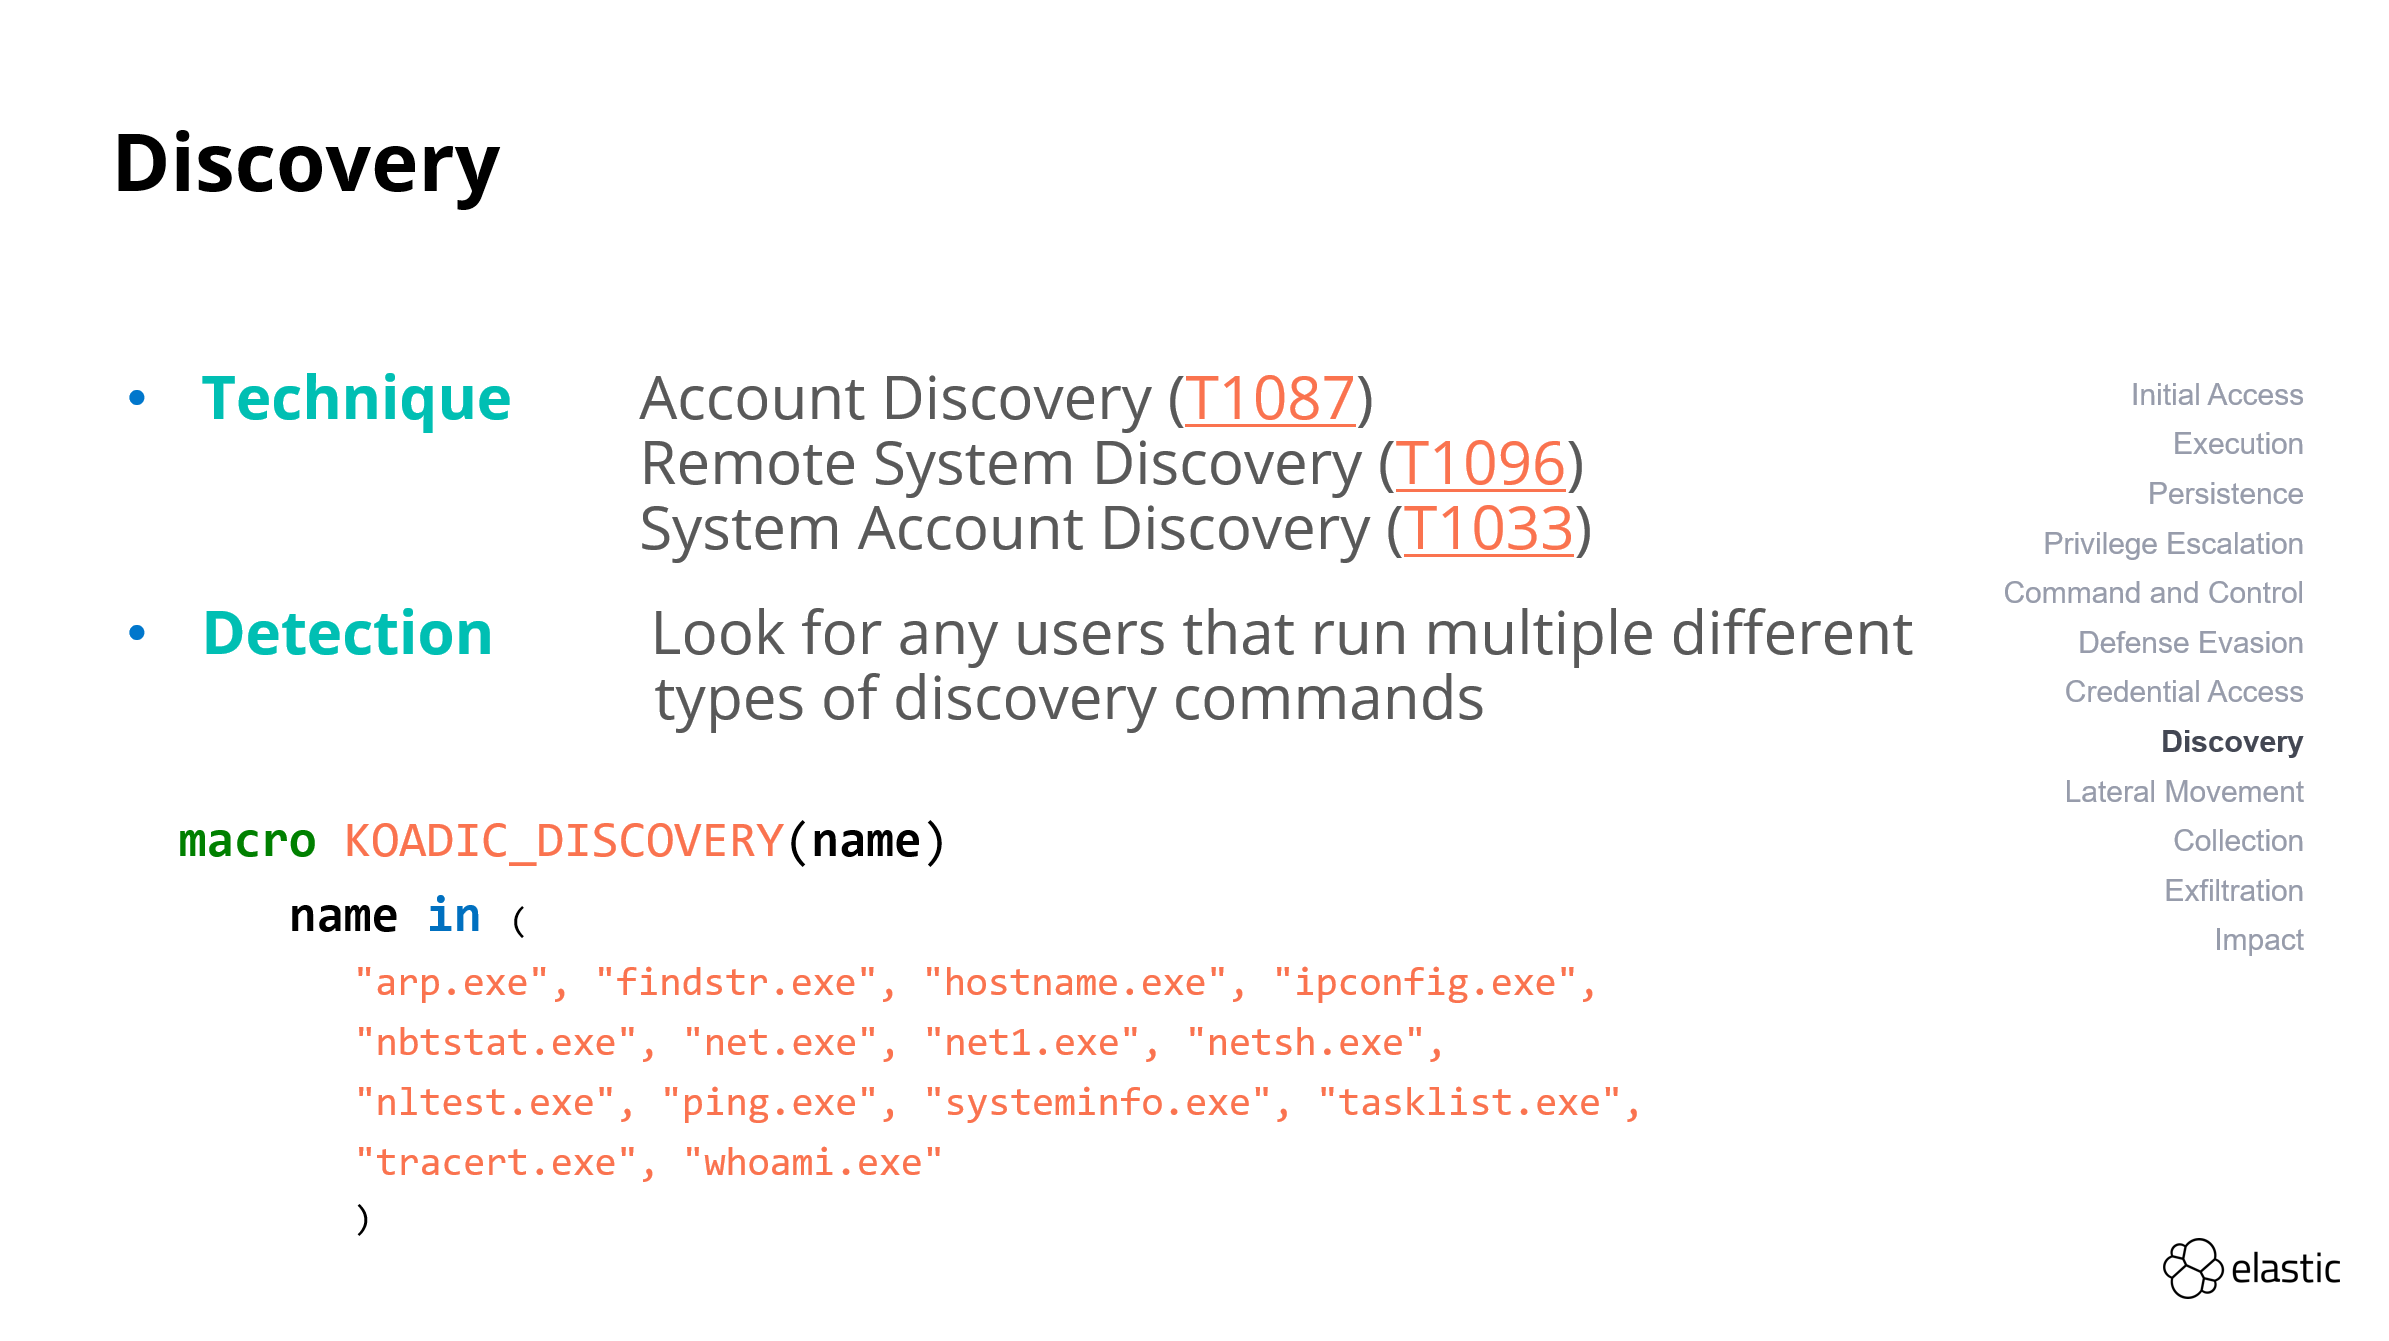 Discovery - macro